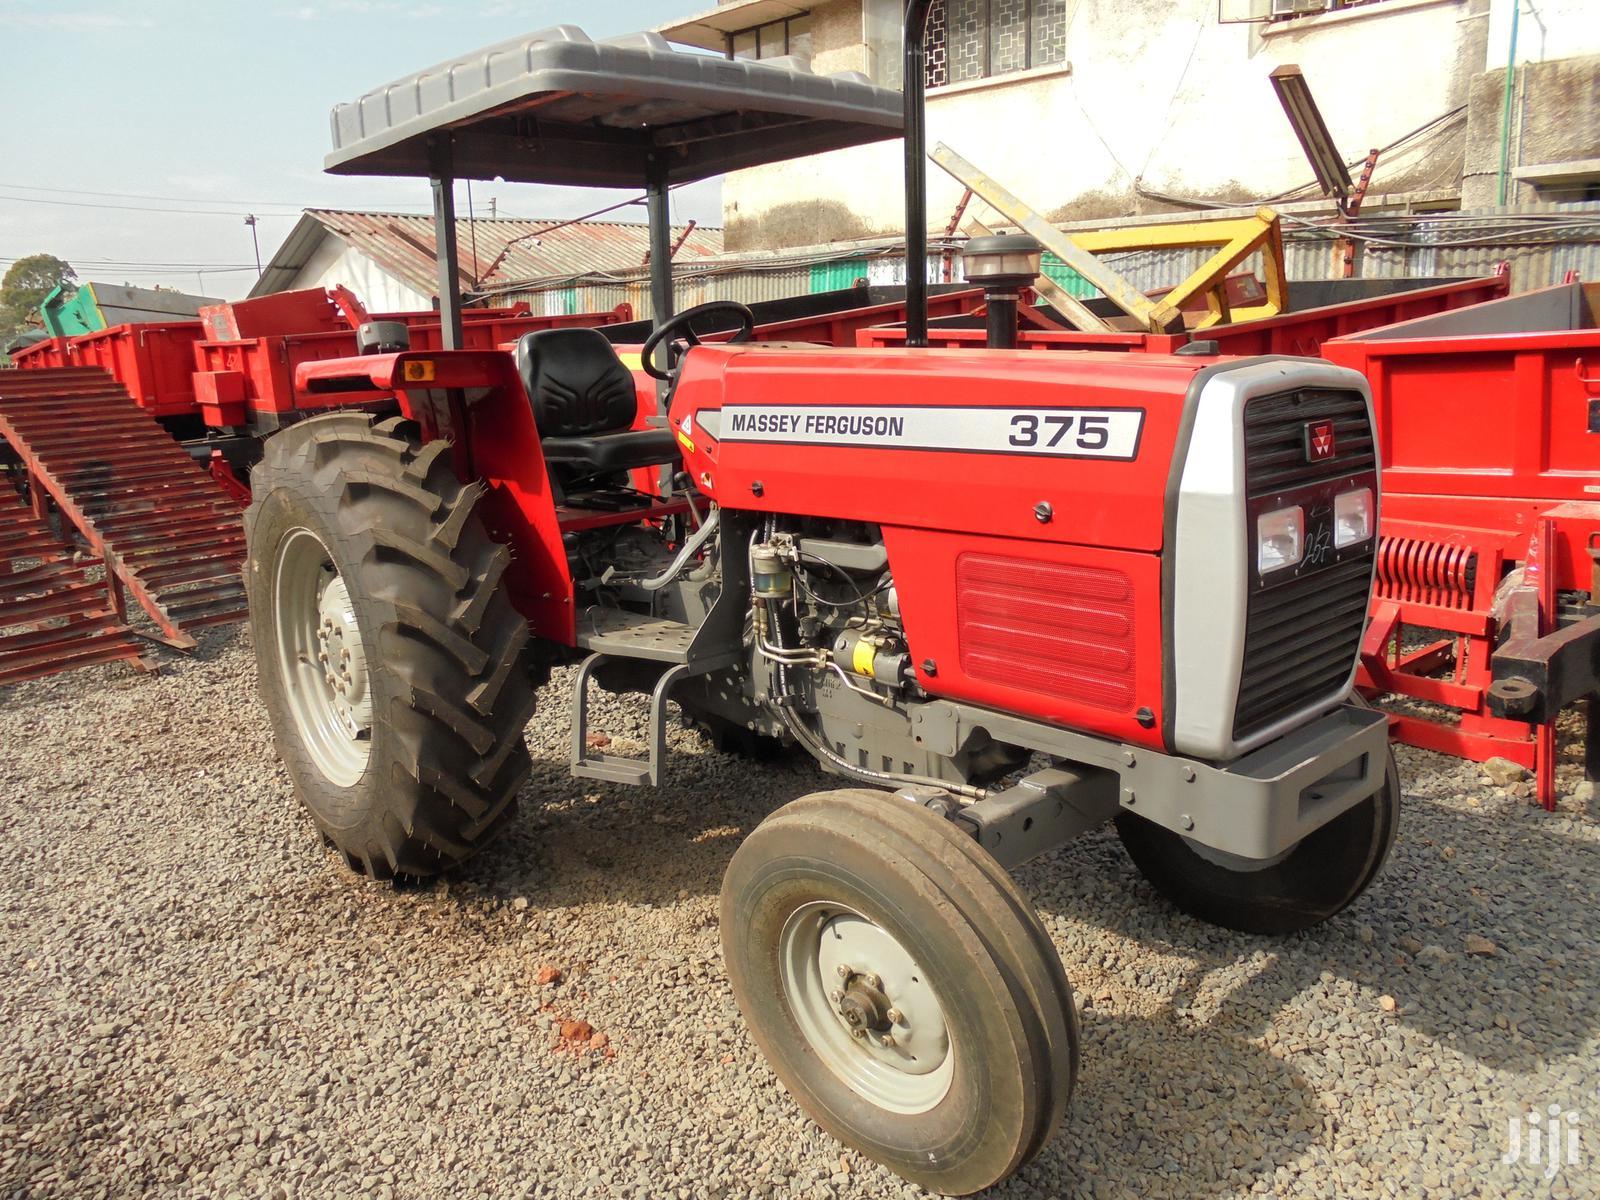 375 Massey Ferguson Tractor